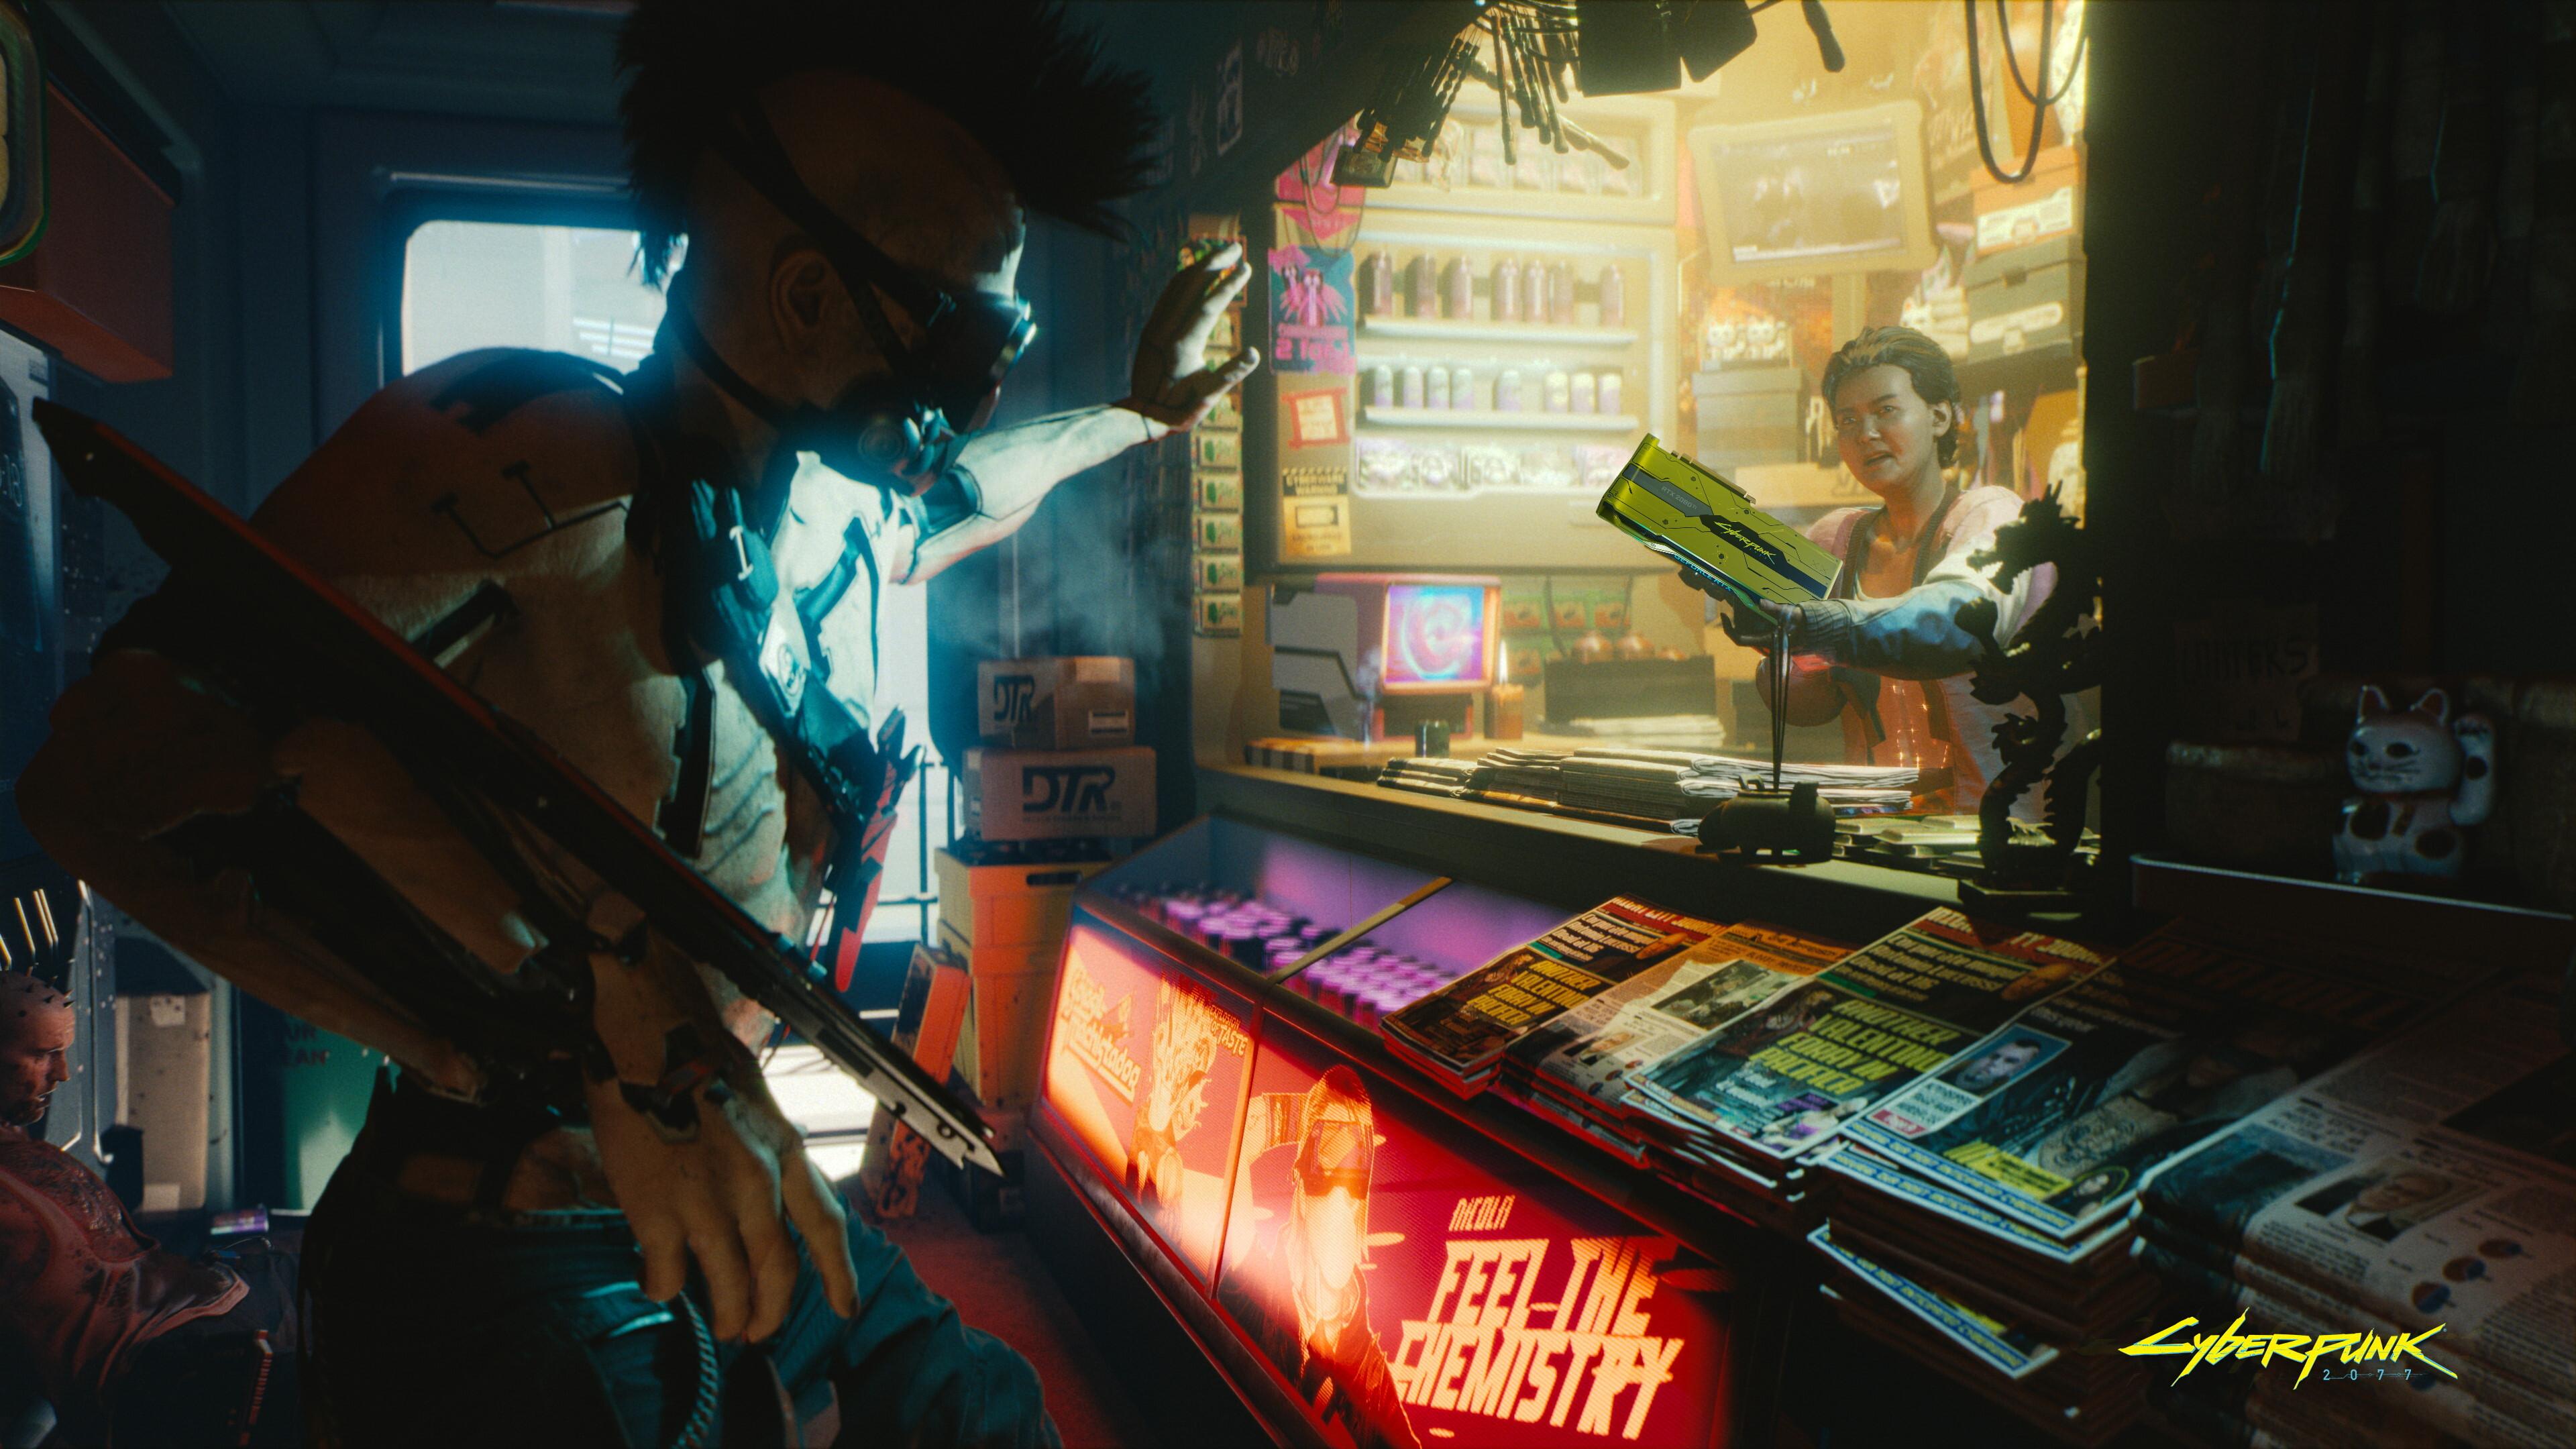 A woman working in a news kiosk in Cyberpunk 2077 desperately proffers a GeForce RTX 2080 Ti GPU at a customer.